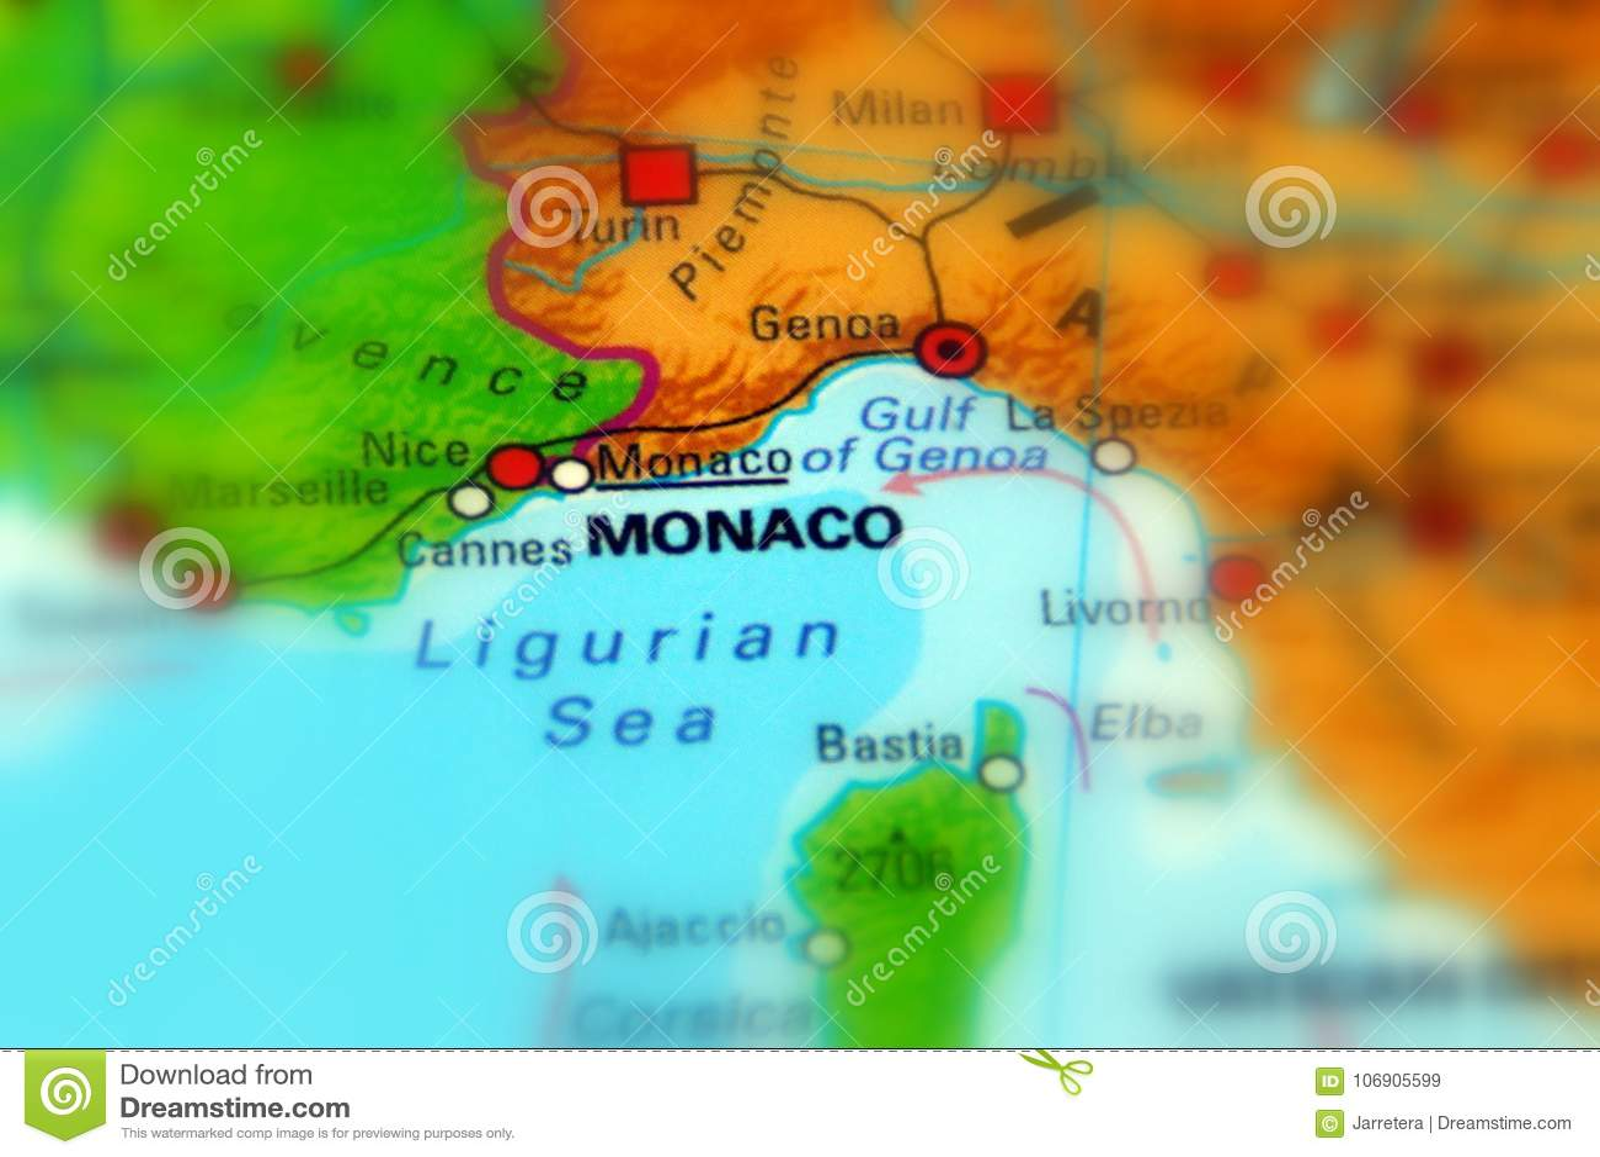 Monaco Monaco ksiąstewko, oficjalnie